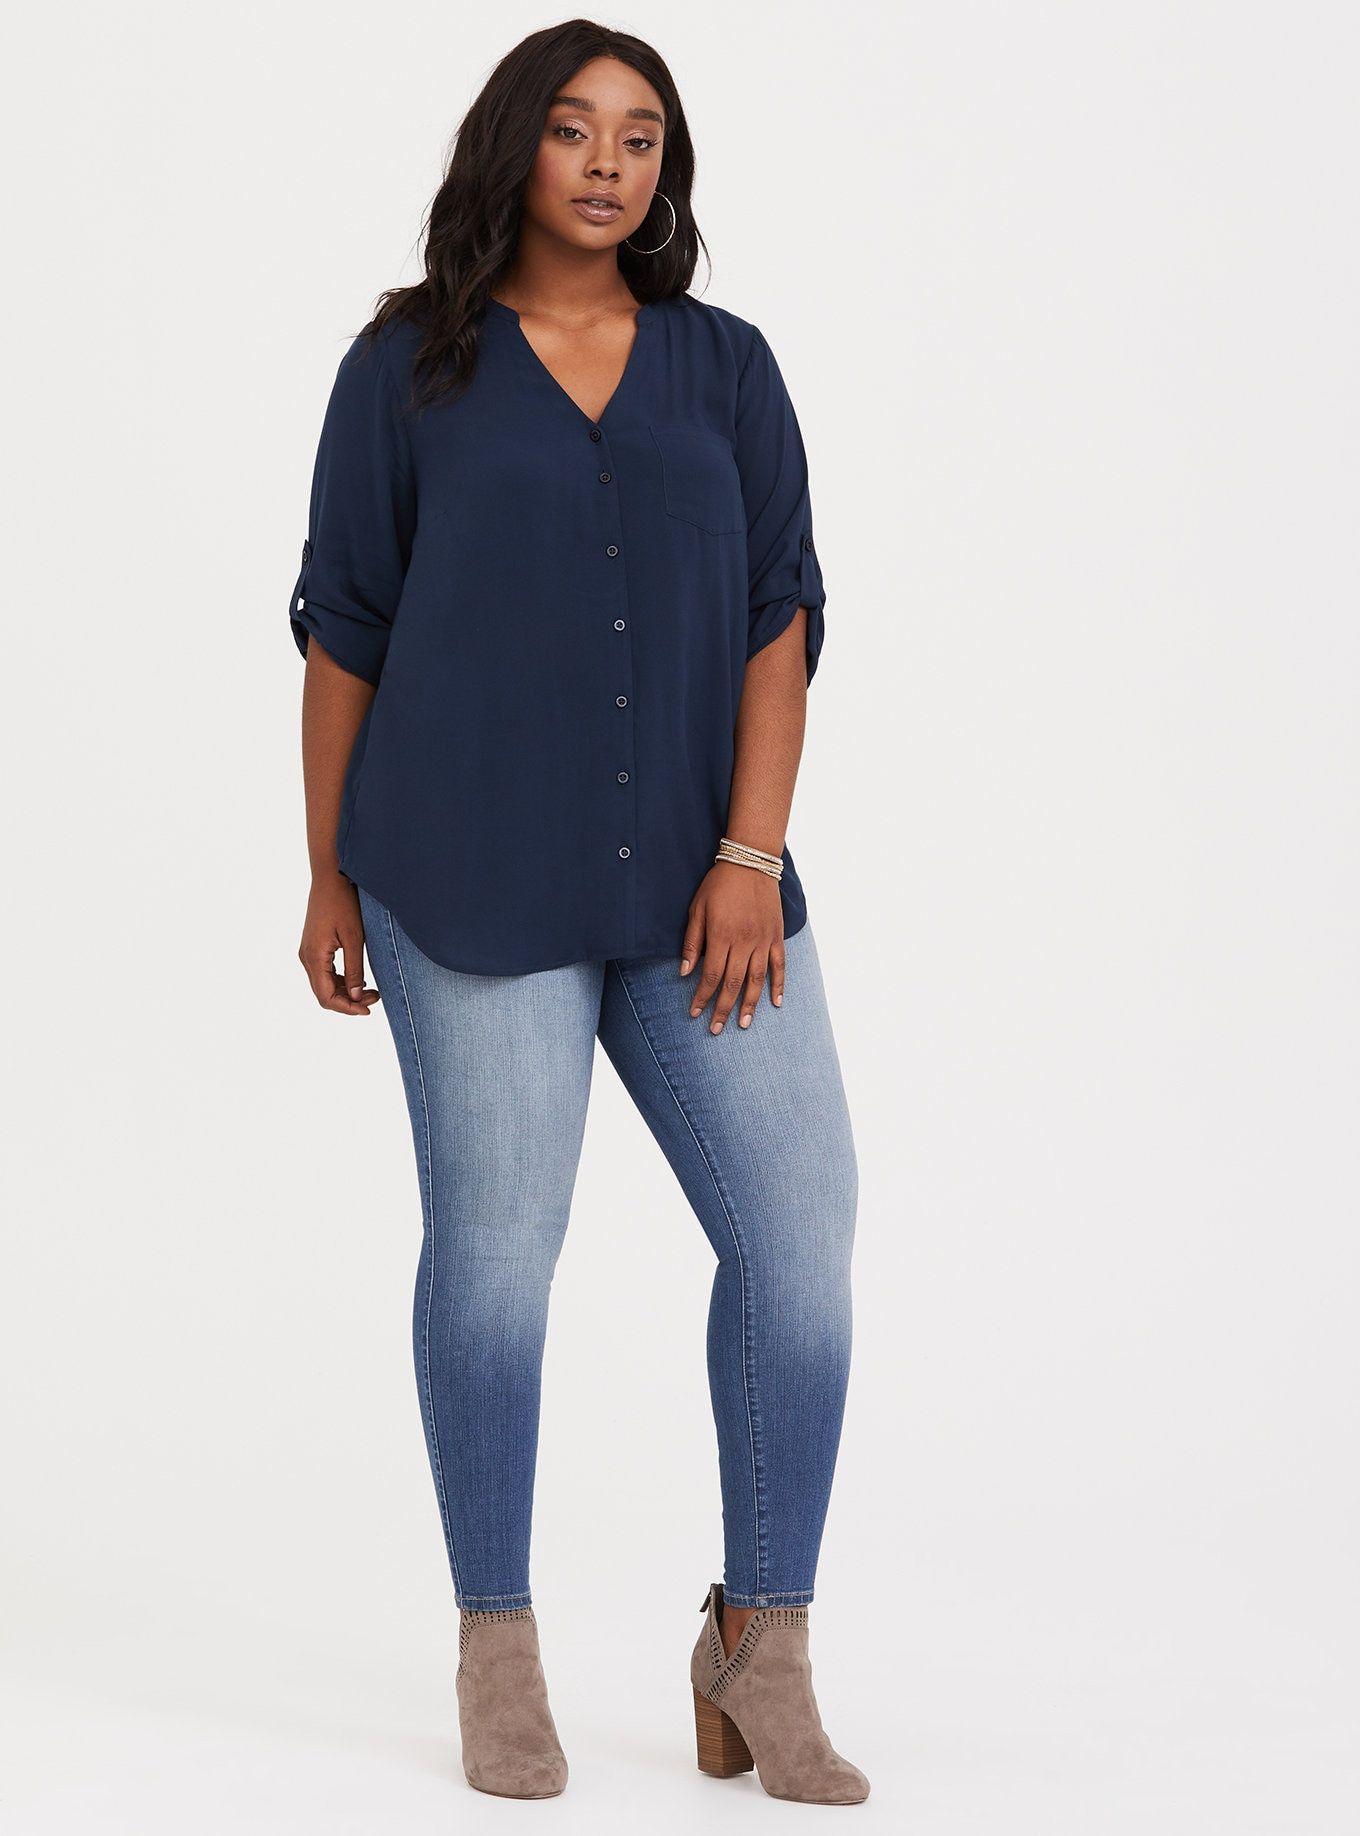 Harper Challis Blouse in 2020 Plus size fashion, Plus